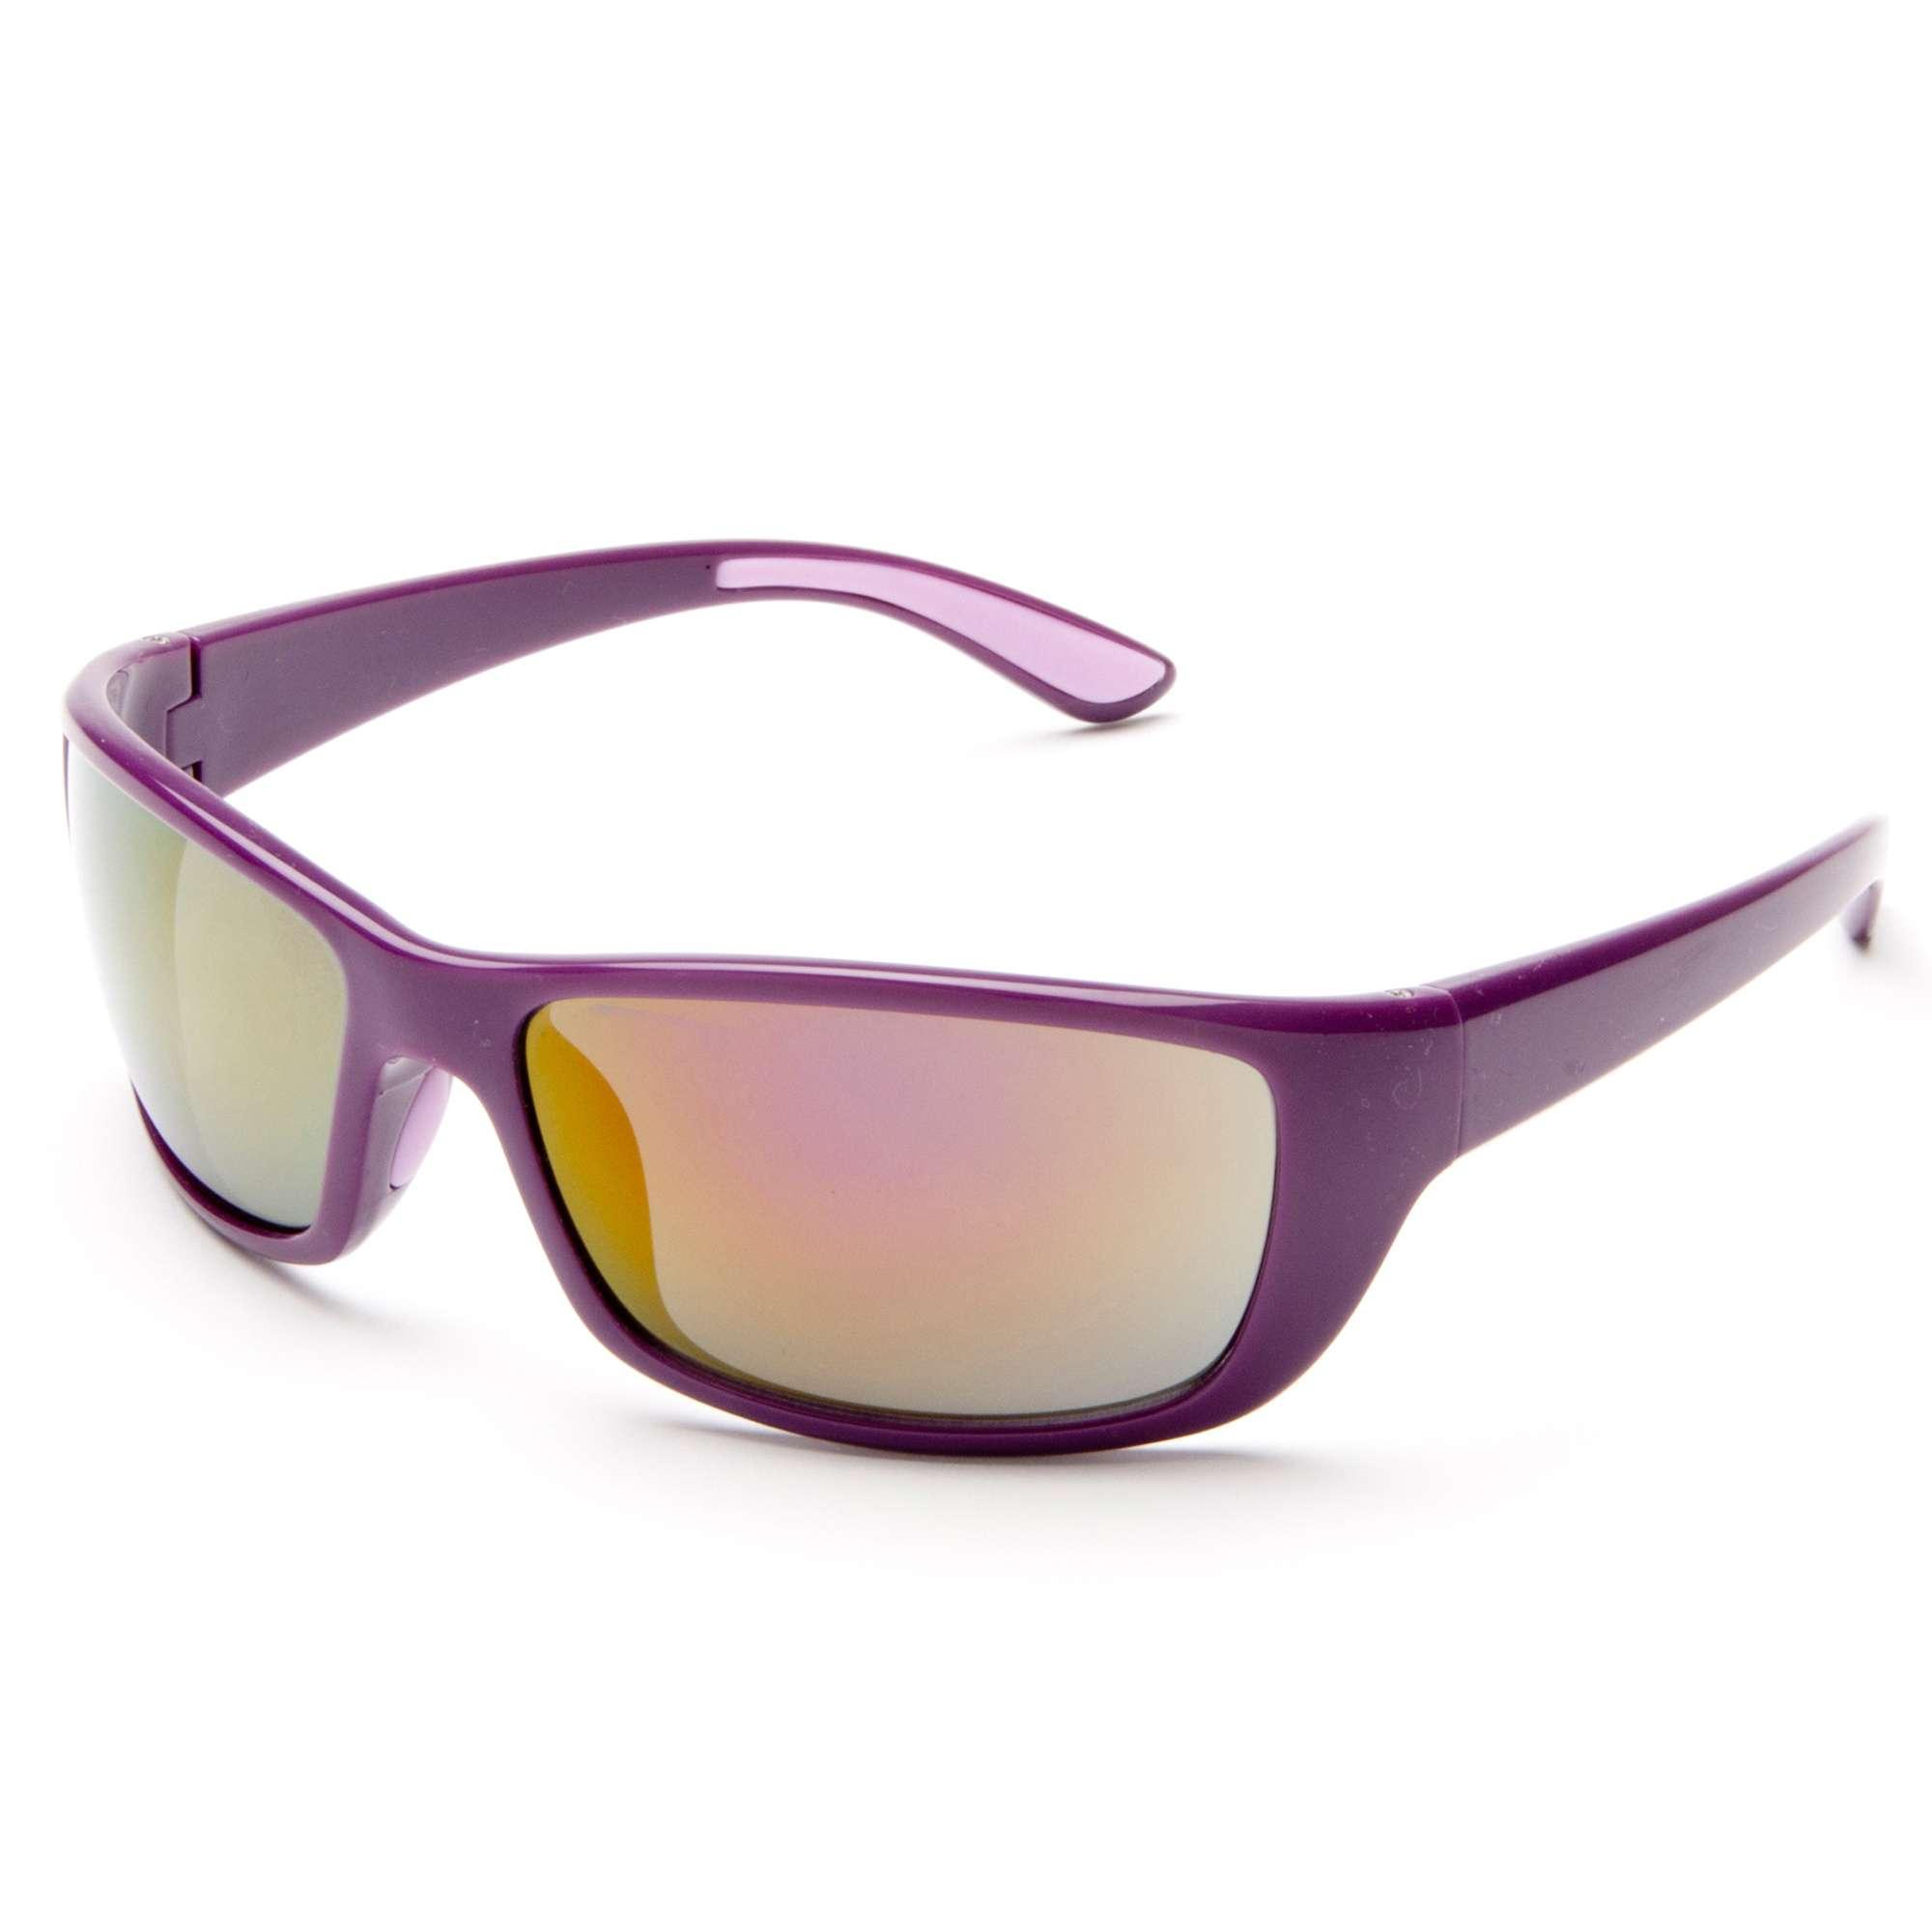 PETER STORM Women's Full Frame Square Lifestyle Sunglasses